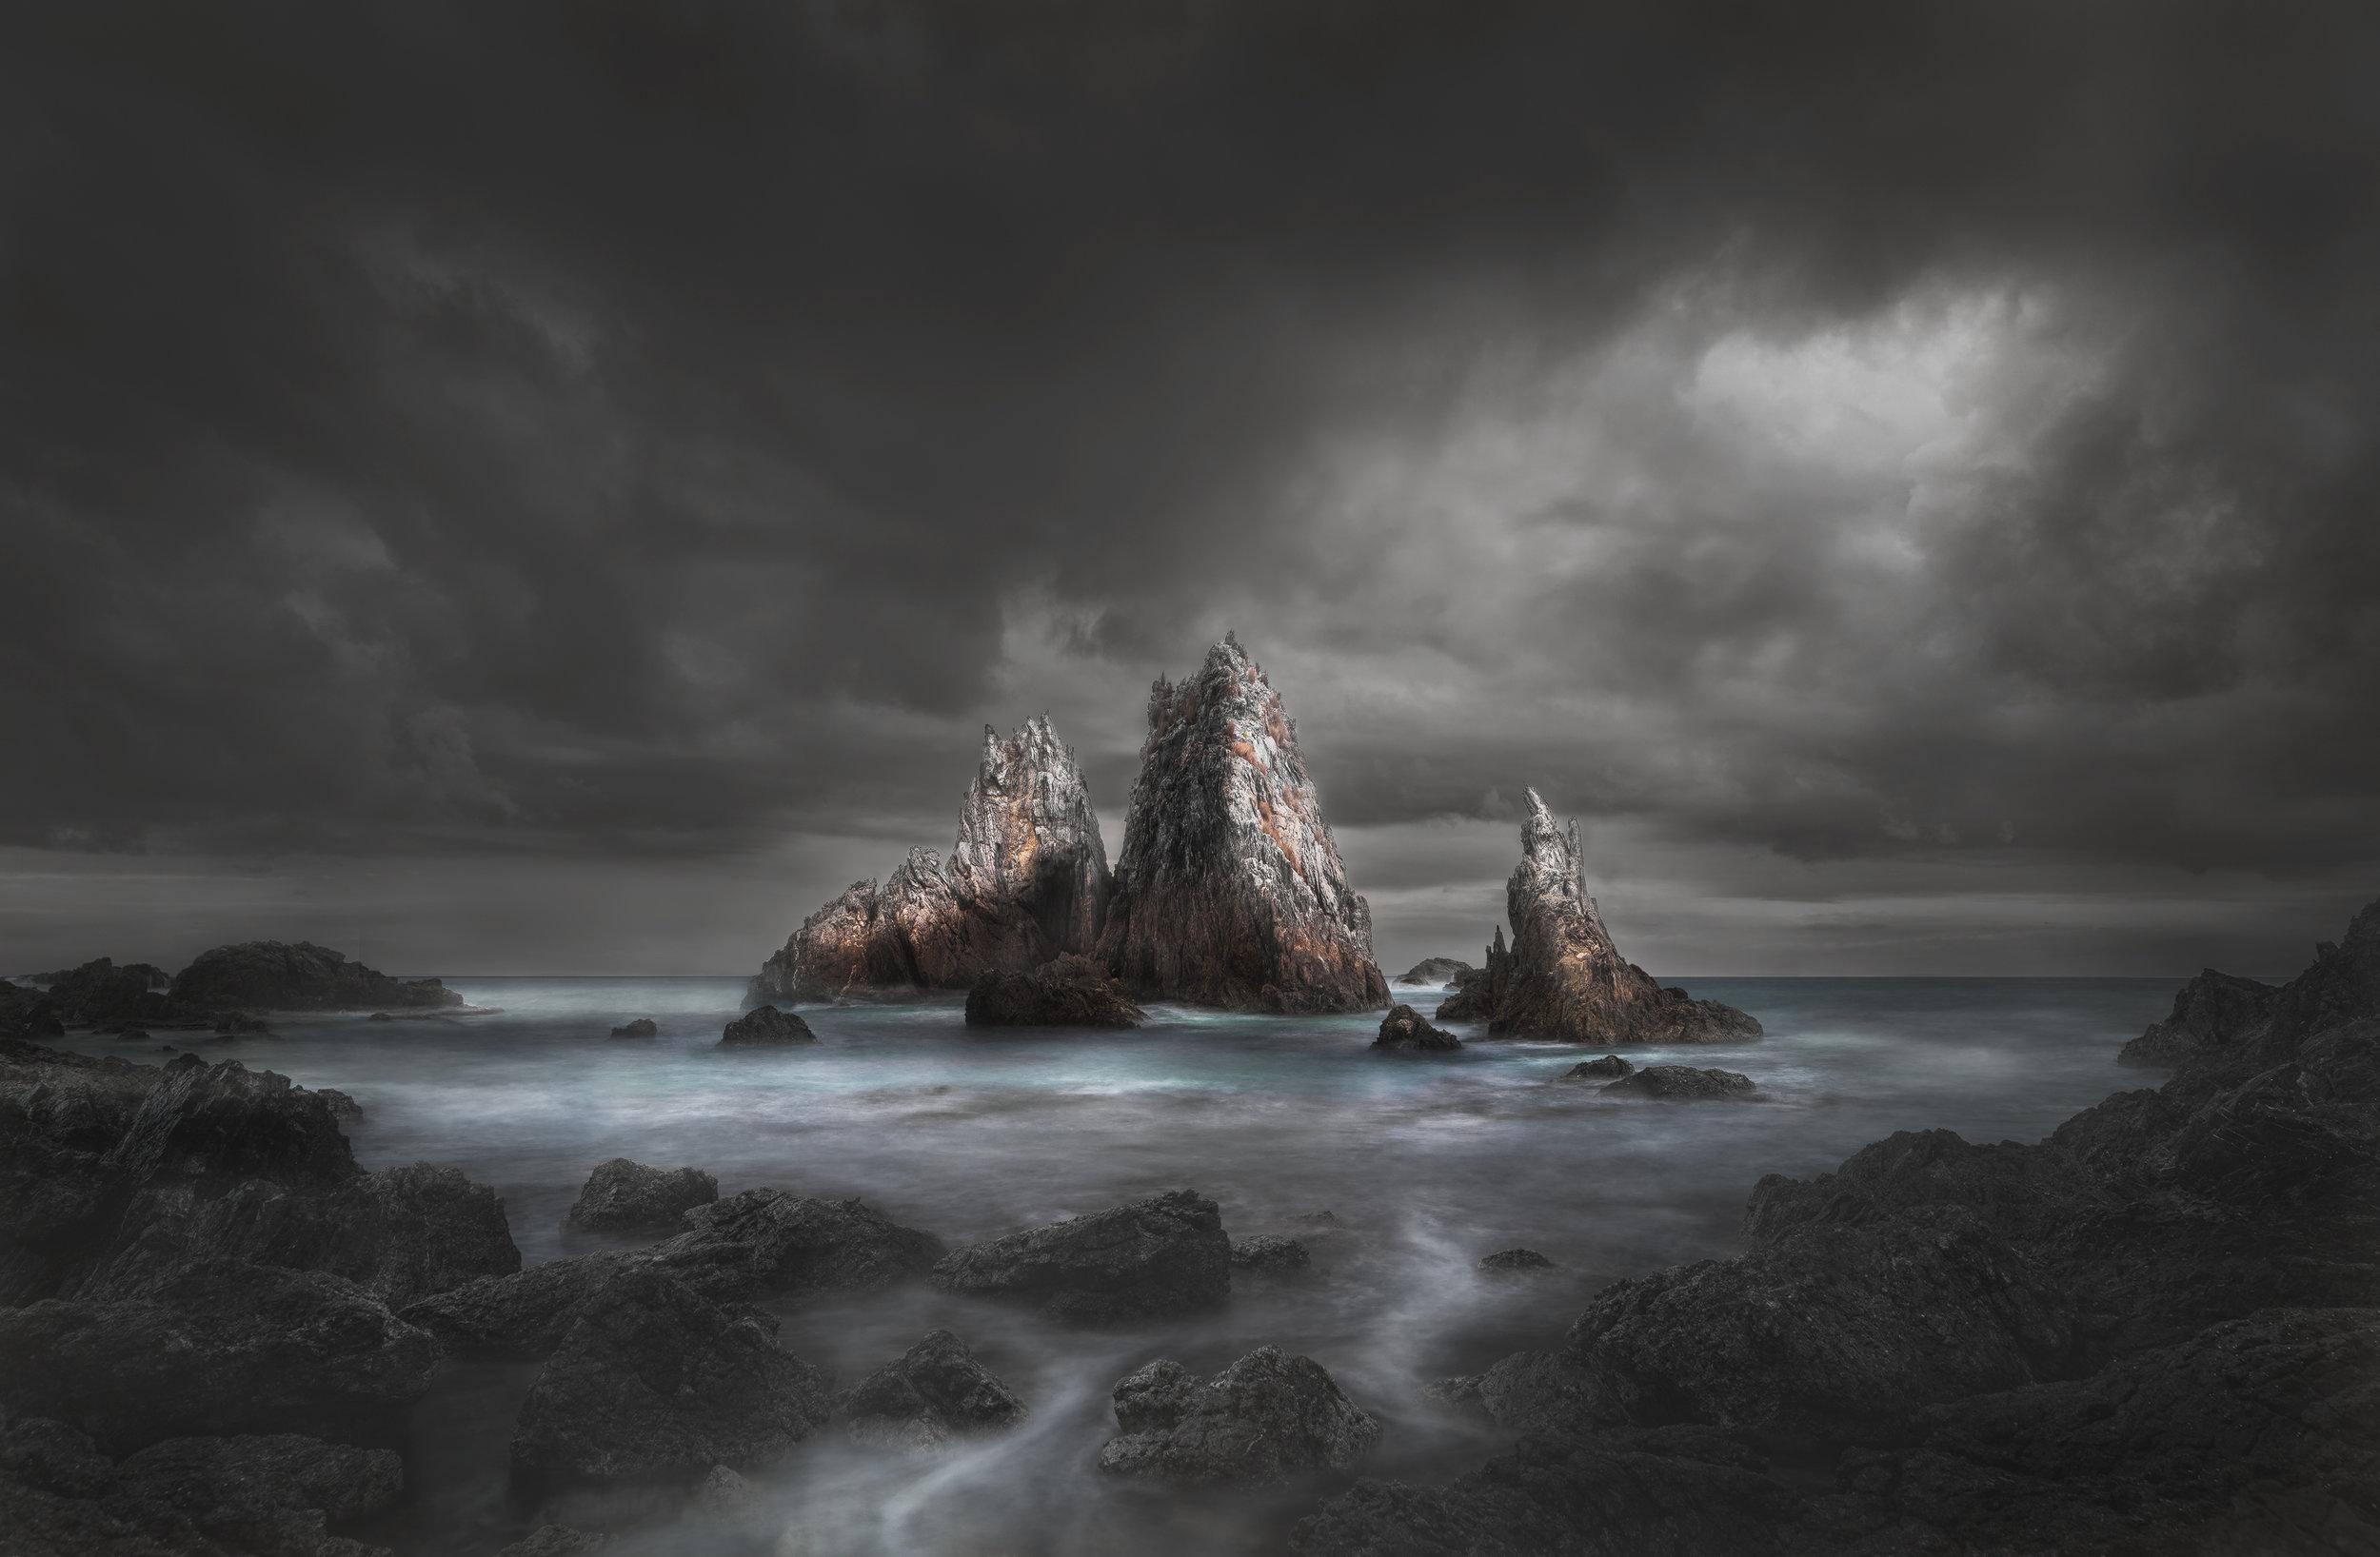 camel rock Black fog 3000.jpg